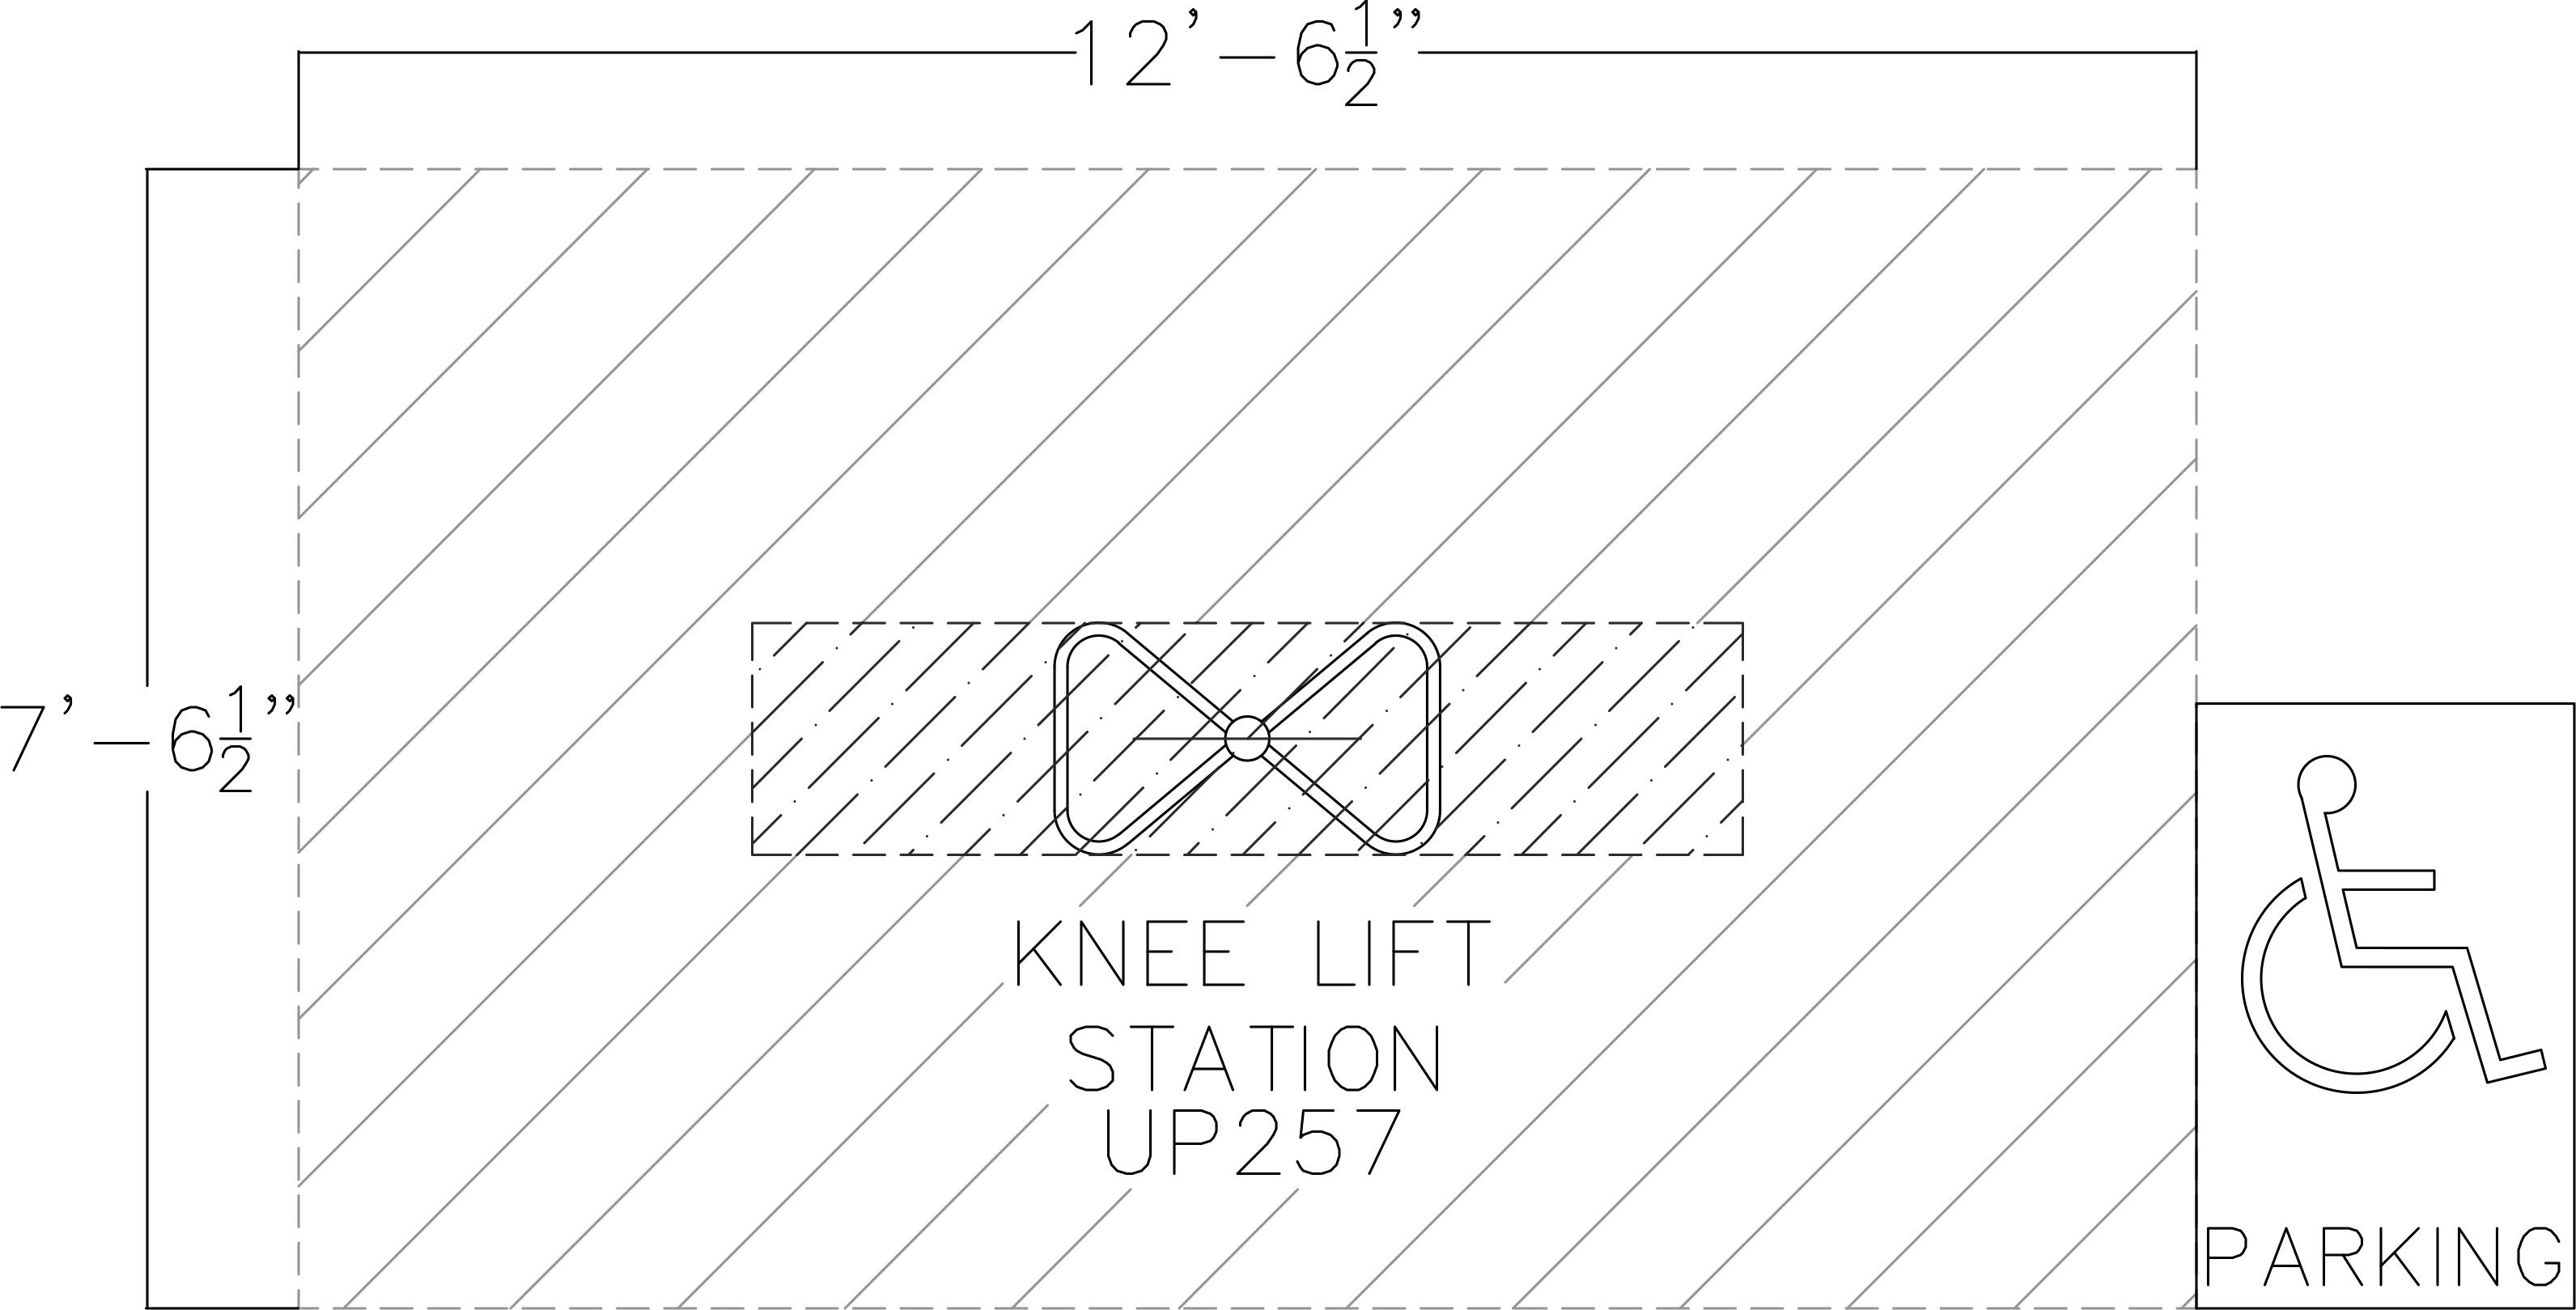 Knee Lift Station